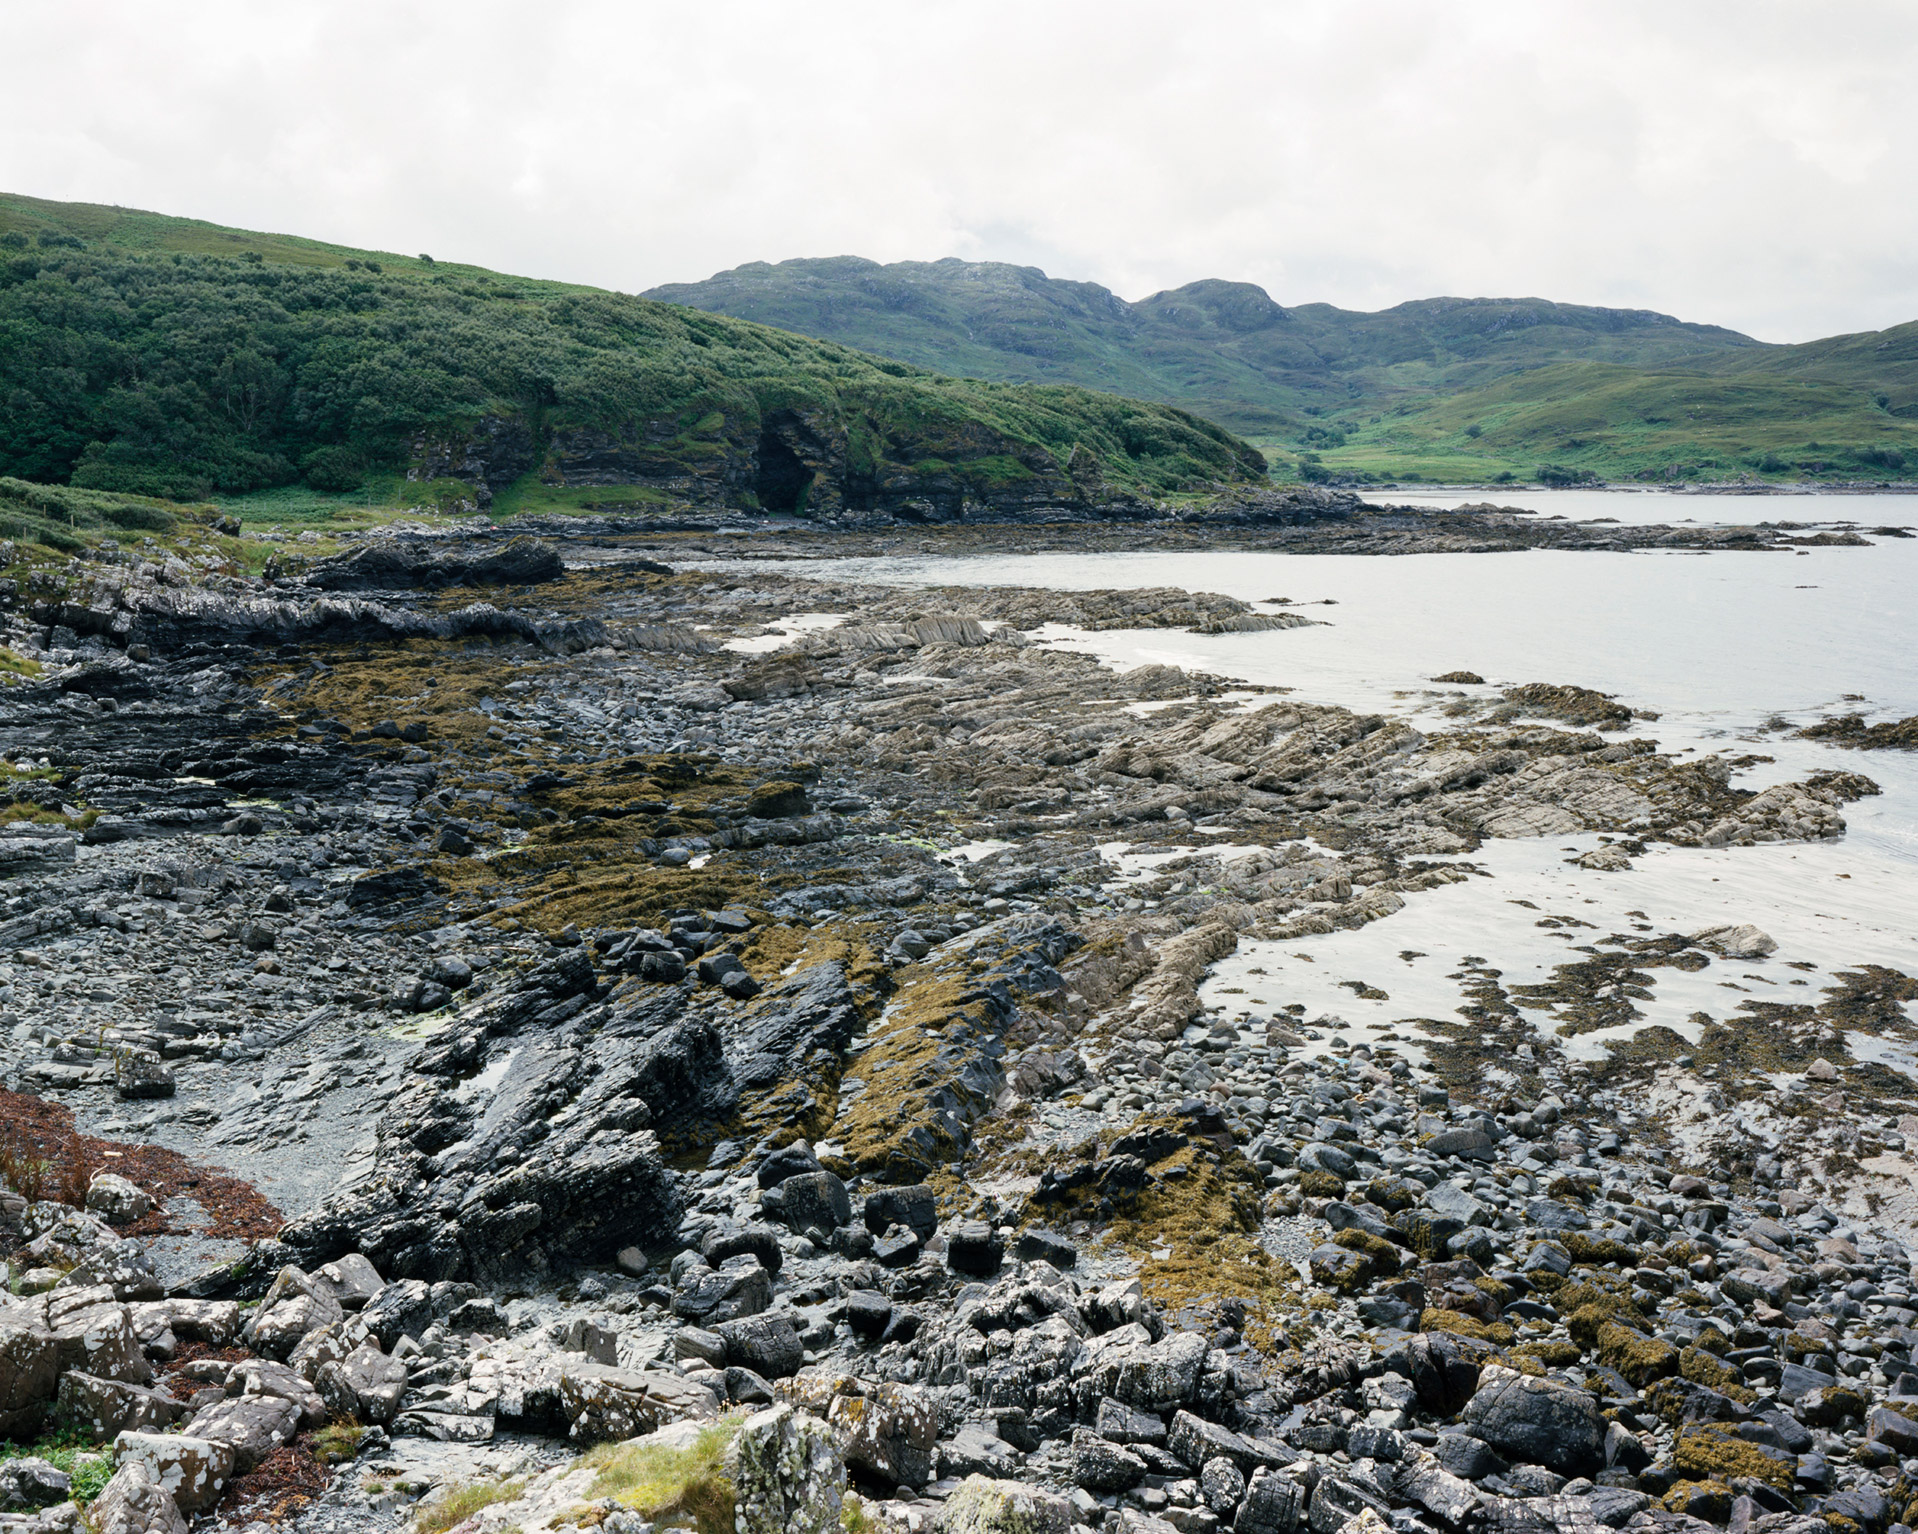 20170701_Scotland_CF10405-KodakPortra400_006.jpg